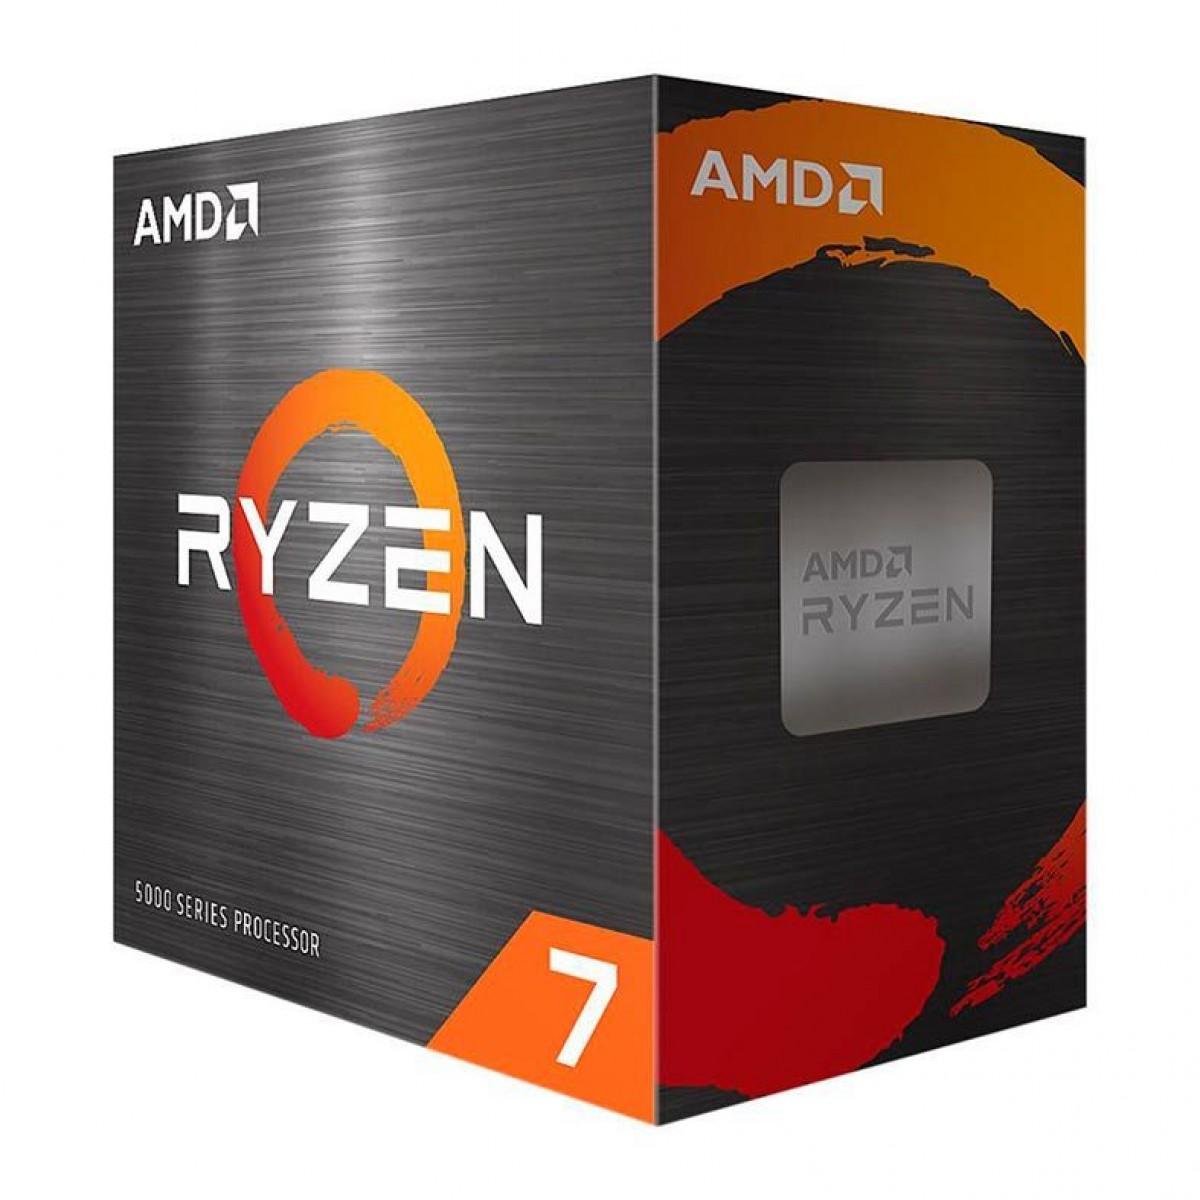 Kit Upgrade, AsRock A520M-HDV + AMD Ryzen 7 5700G + Memória DDR4, 8GB 3000MHz